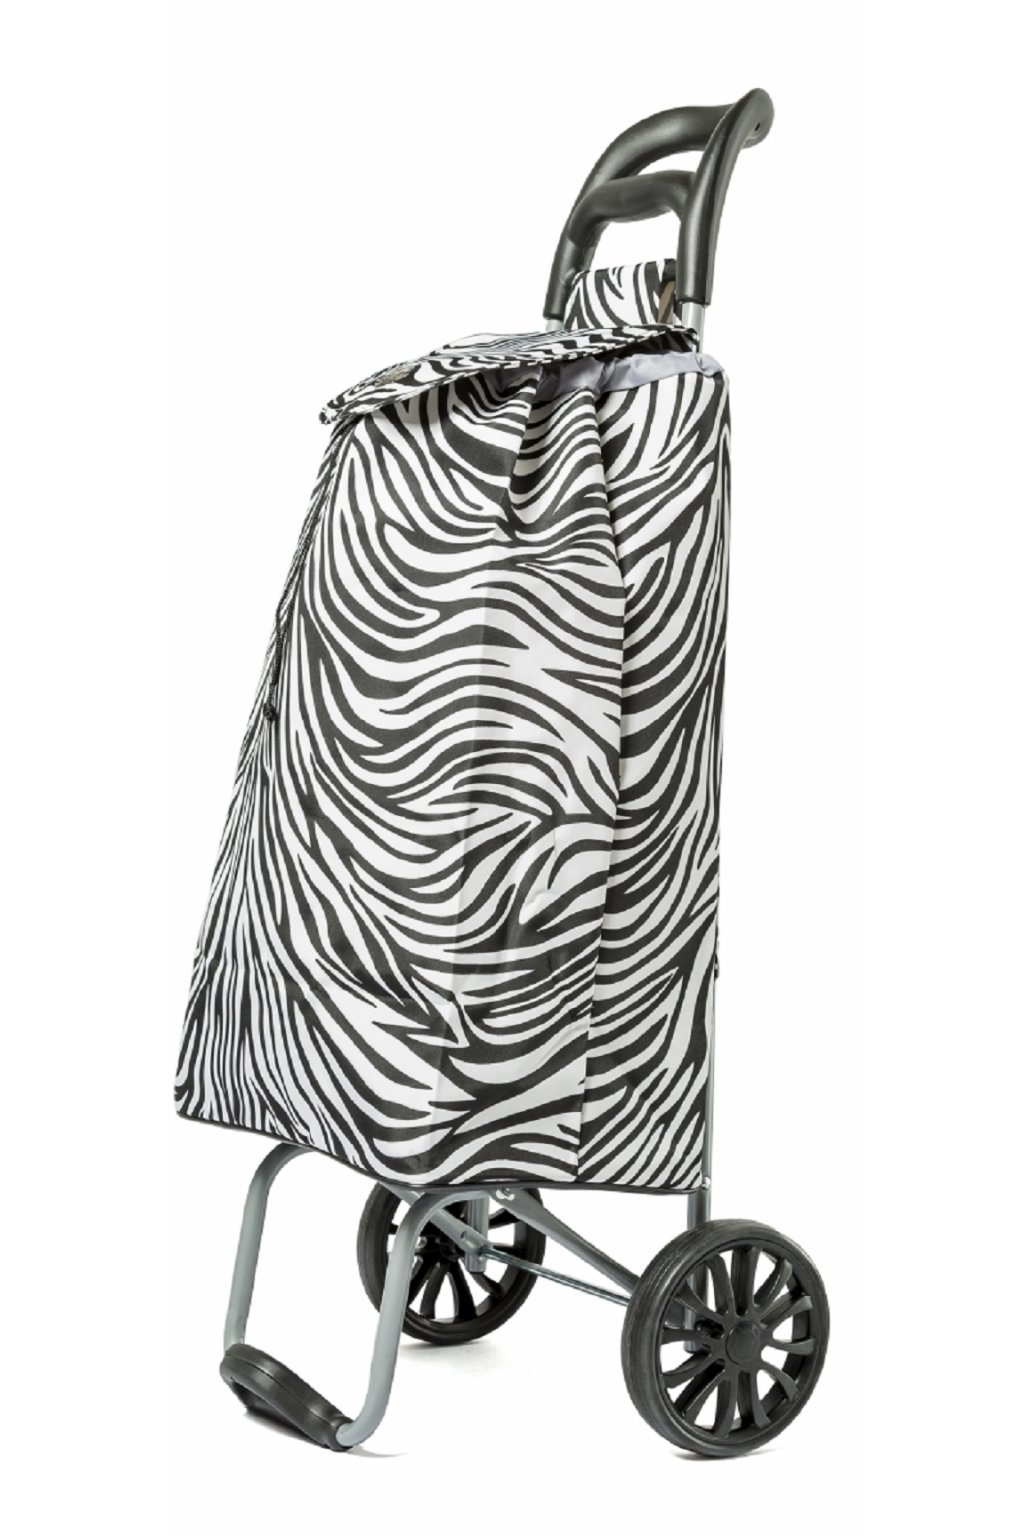 kufrland epic cityshopperx ergo zebra nakupnitaska (2)